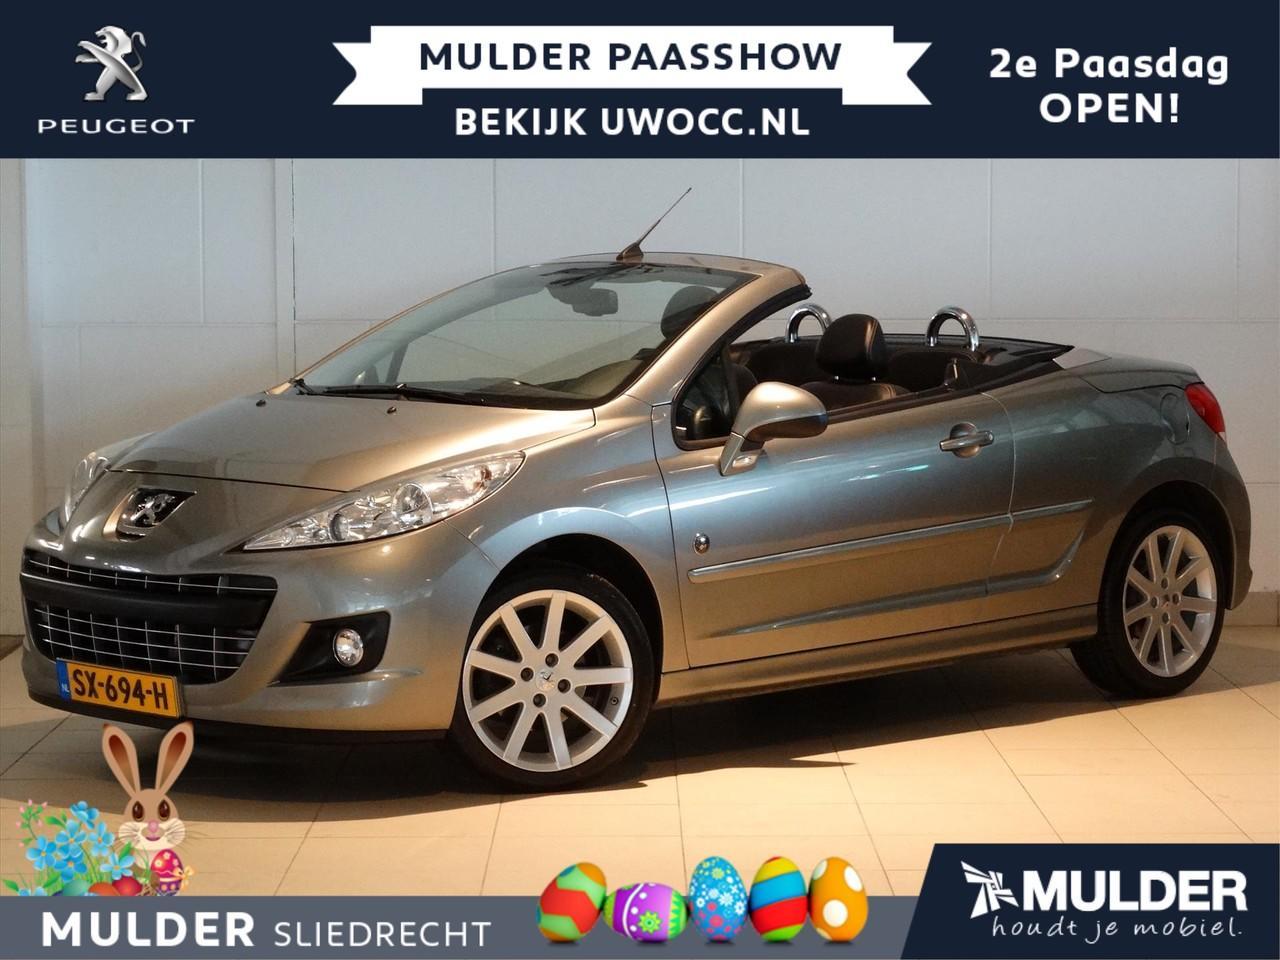 Peugeot 207 Cc roland garros 1.6 vti 16v 120pk clima